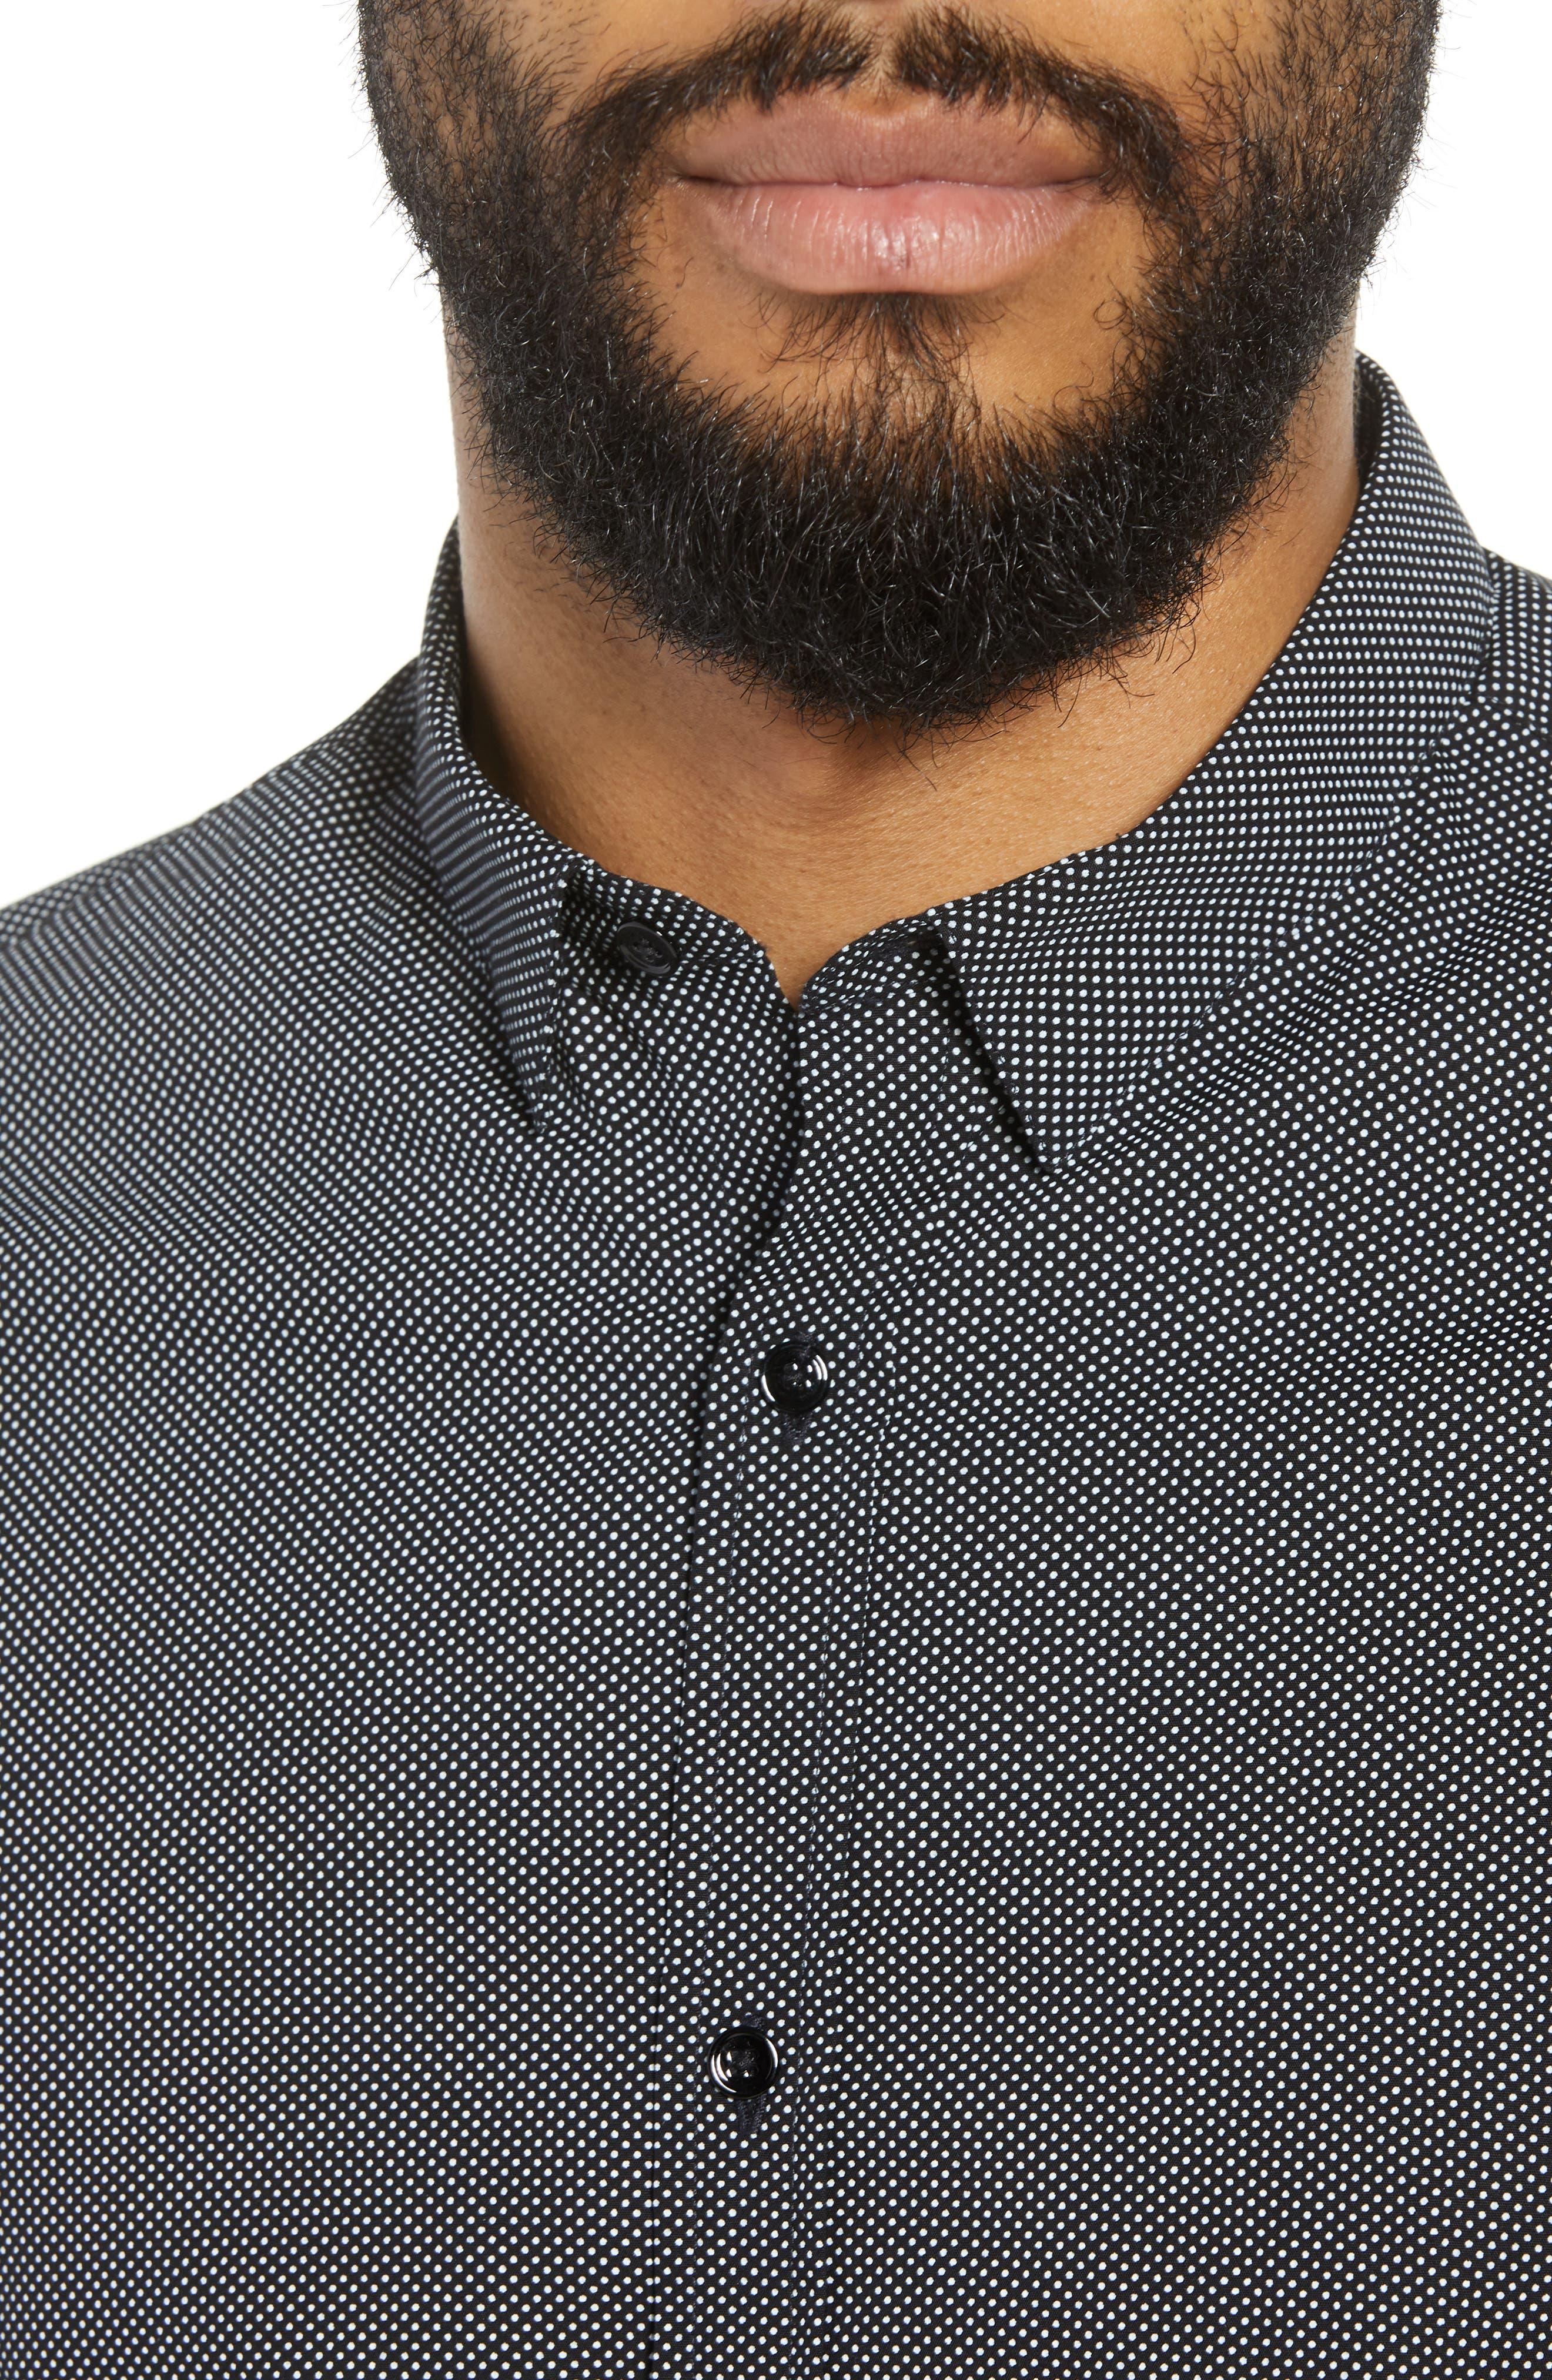 Slim Fit Print Sport Shirt,                             Alternate thumbnail 4, color,                             415